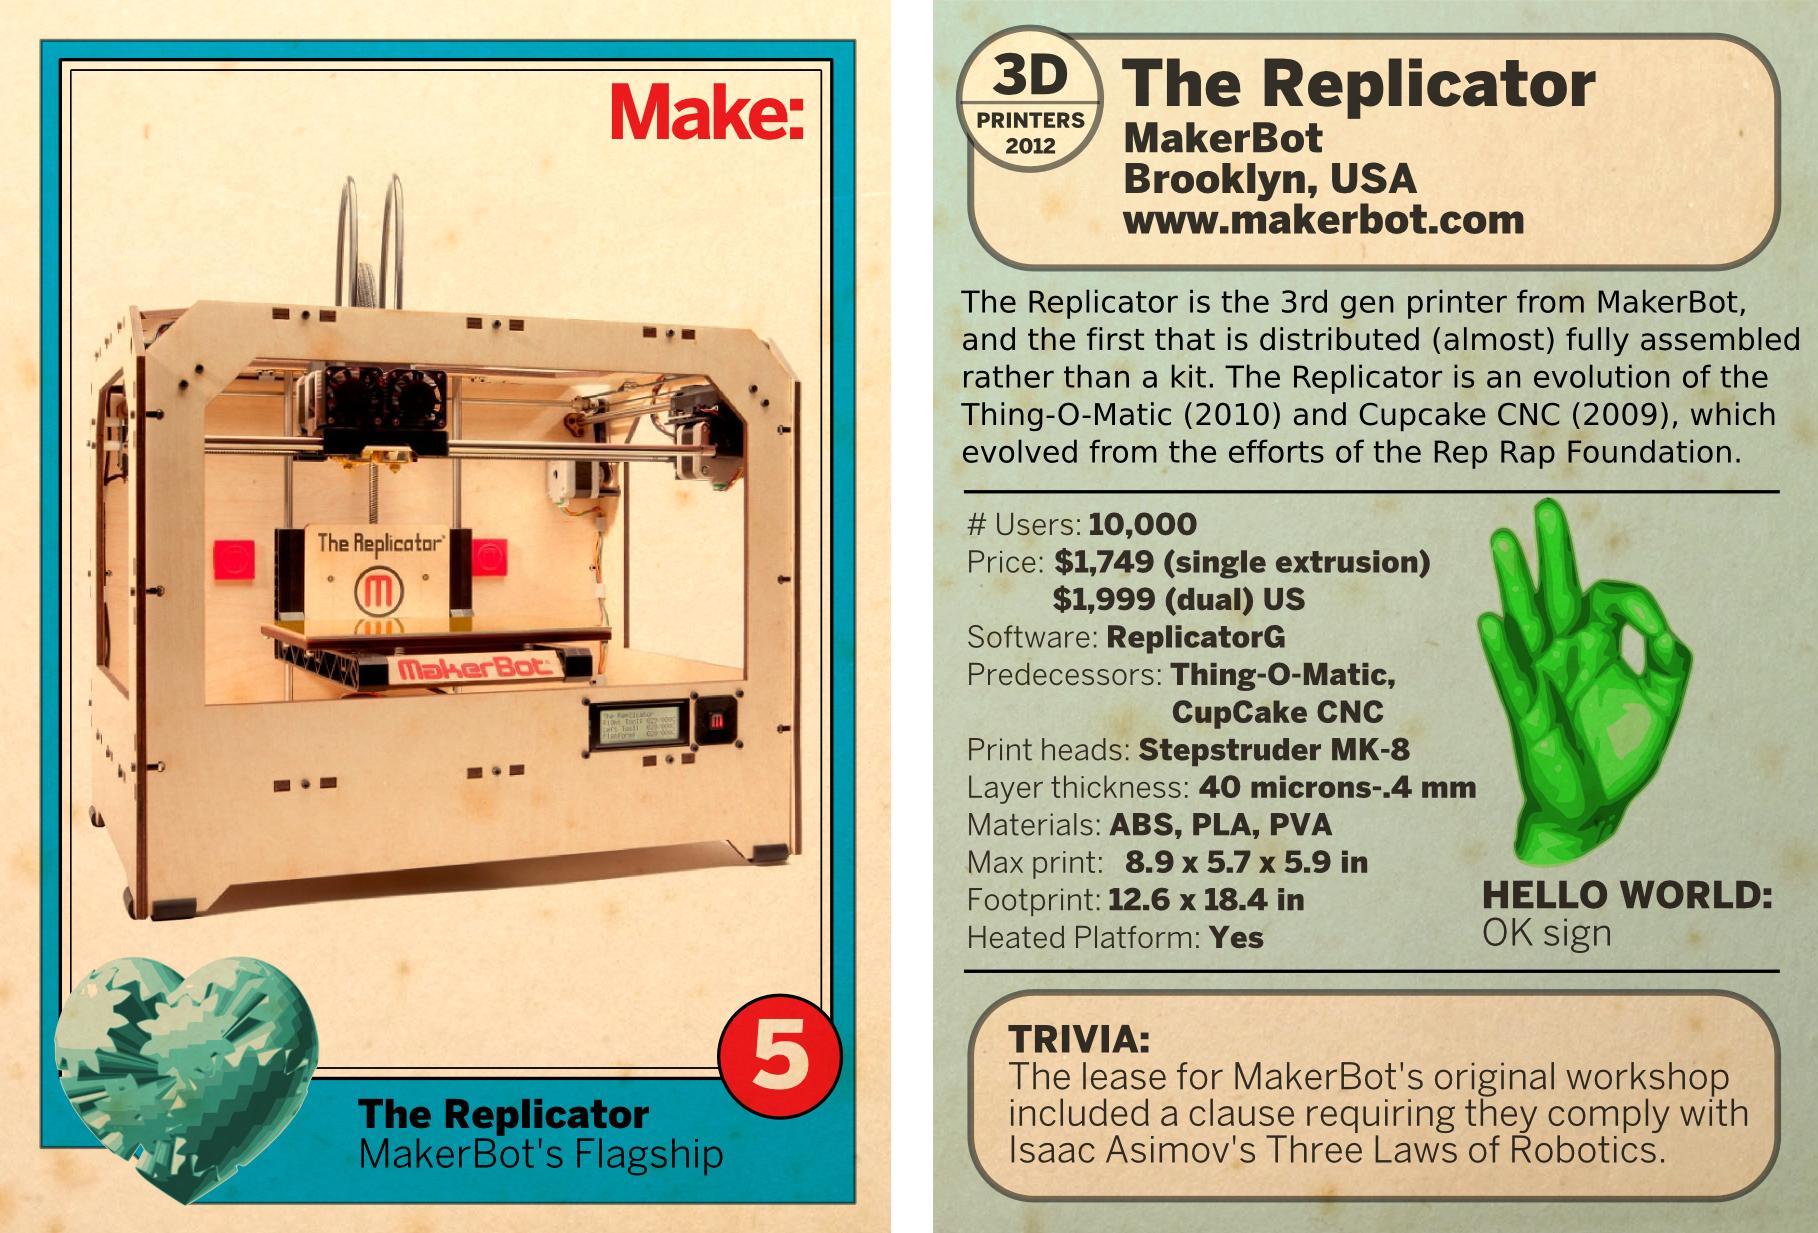 The Replicator